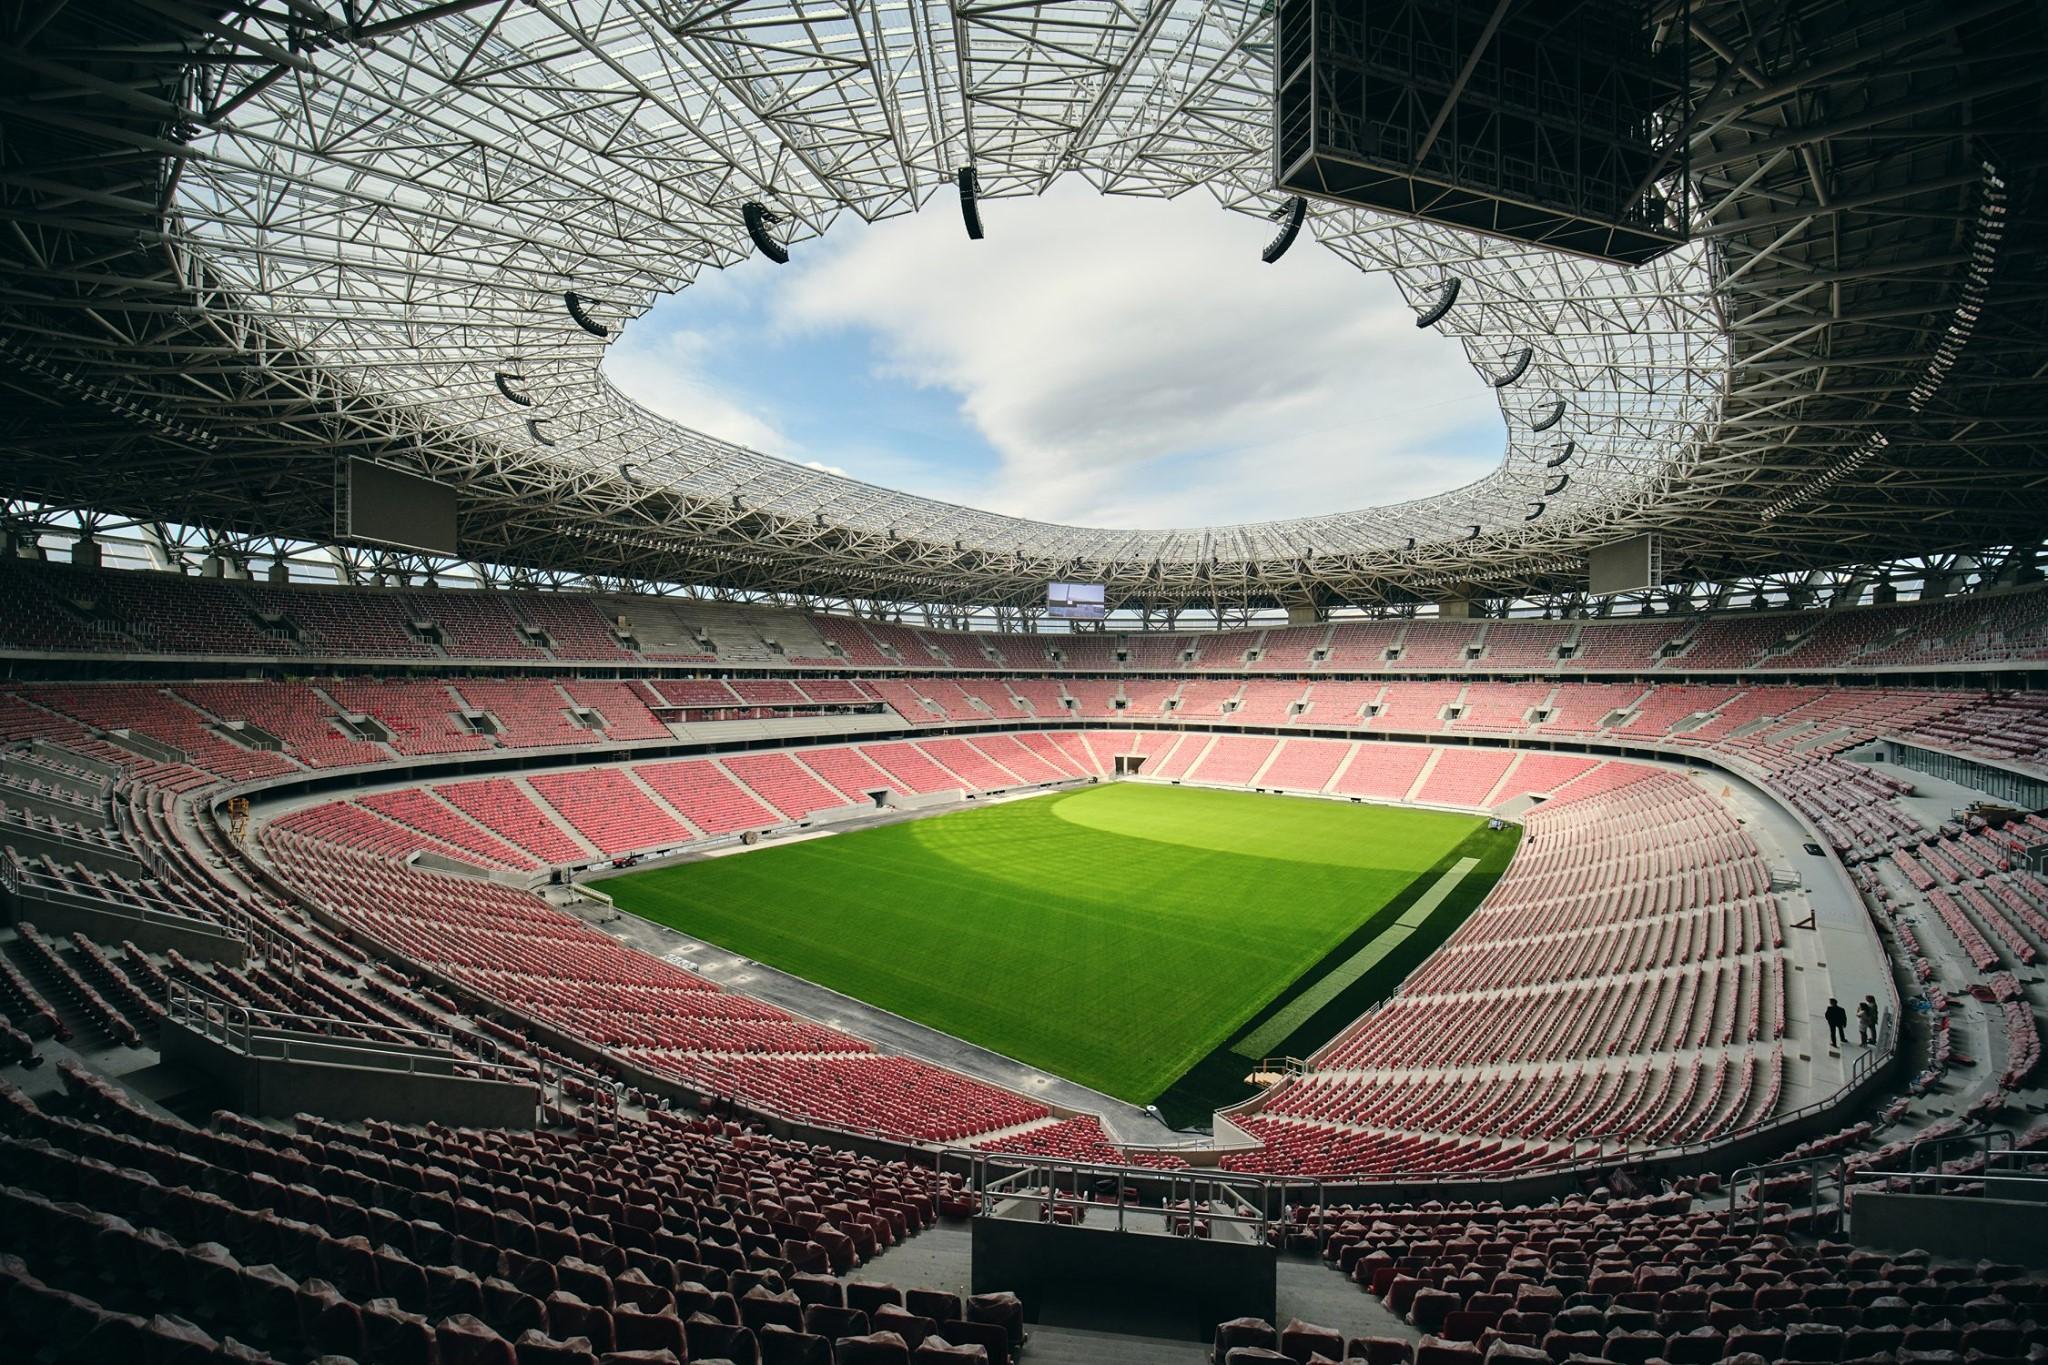 "Resultado de imagen para ferenc puskas stadium"""